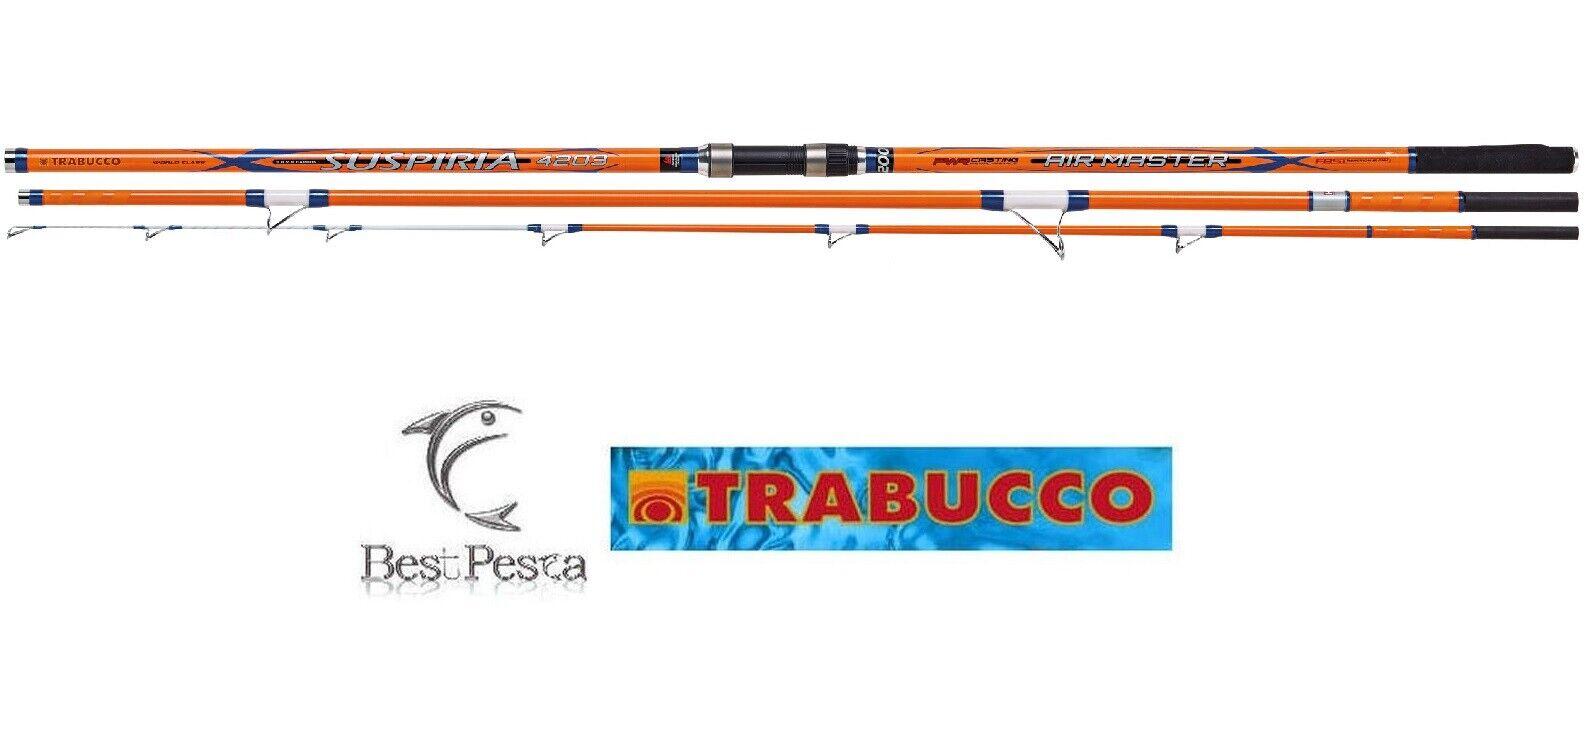 Trabucco SUSPIRIA AIRMASTER LC - 4.2mt - 200gr-Code   171-99-100  offering store